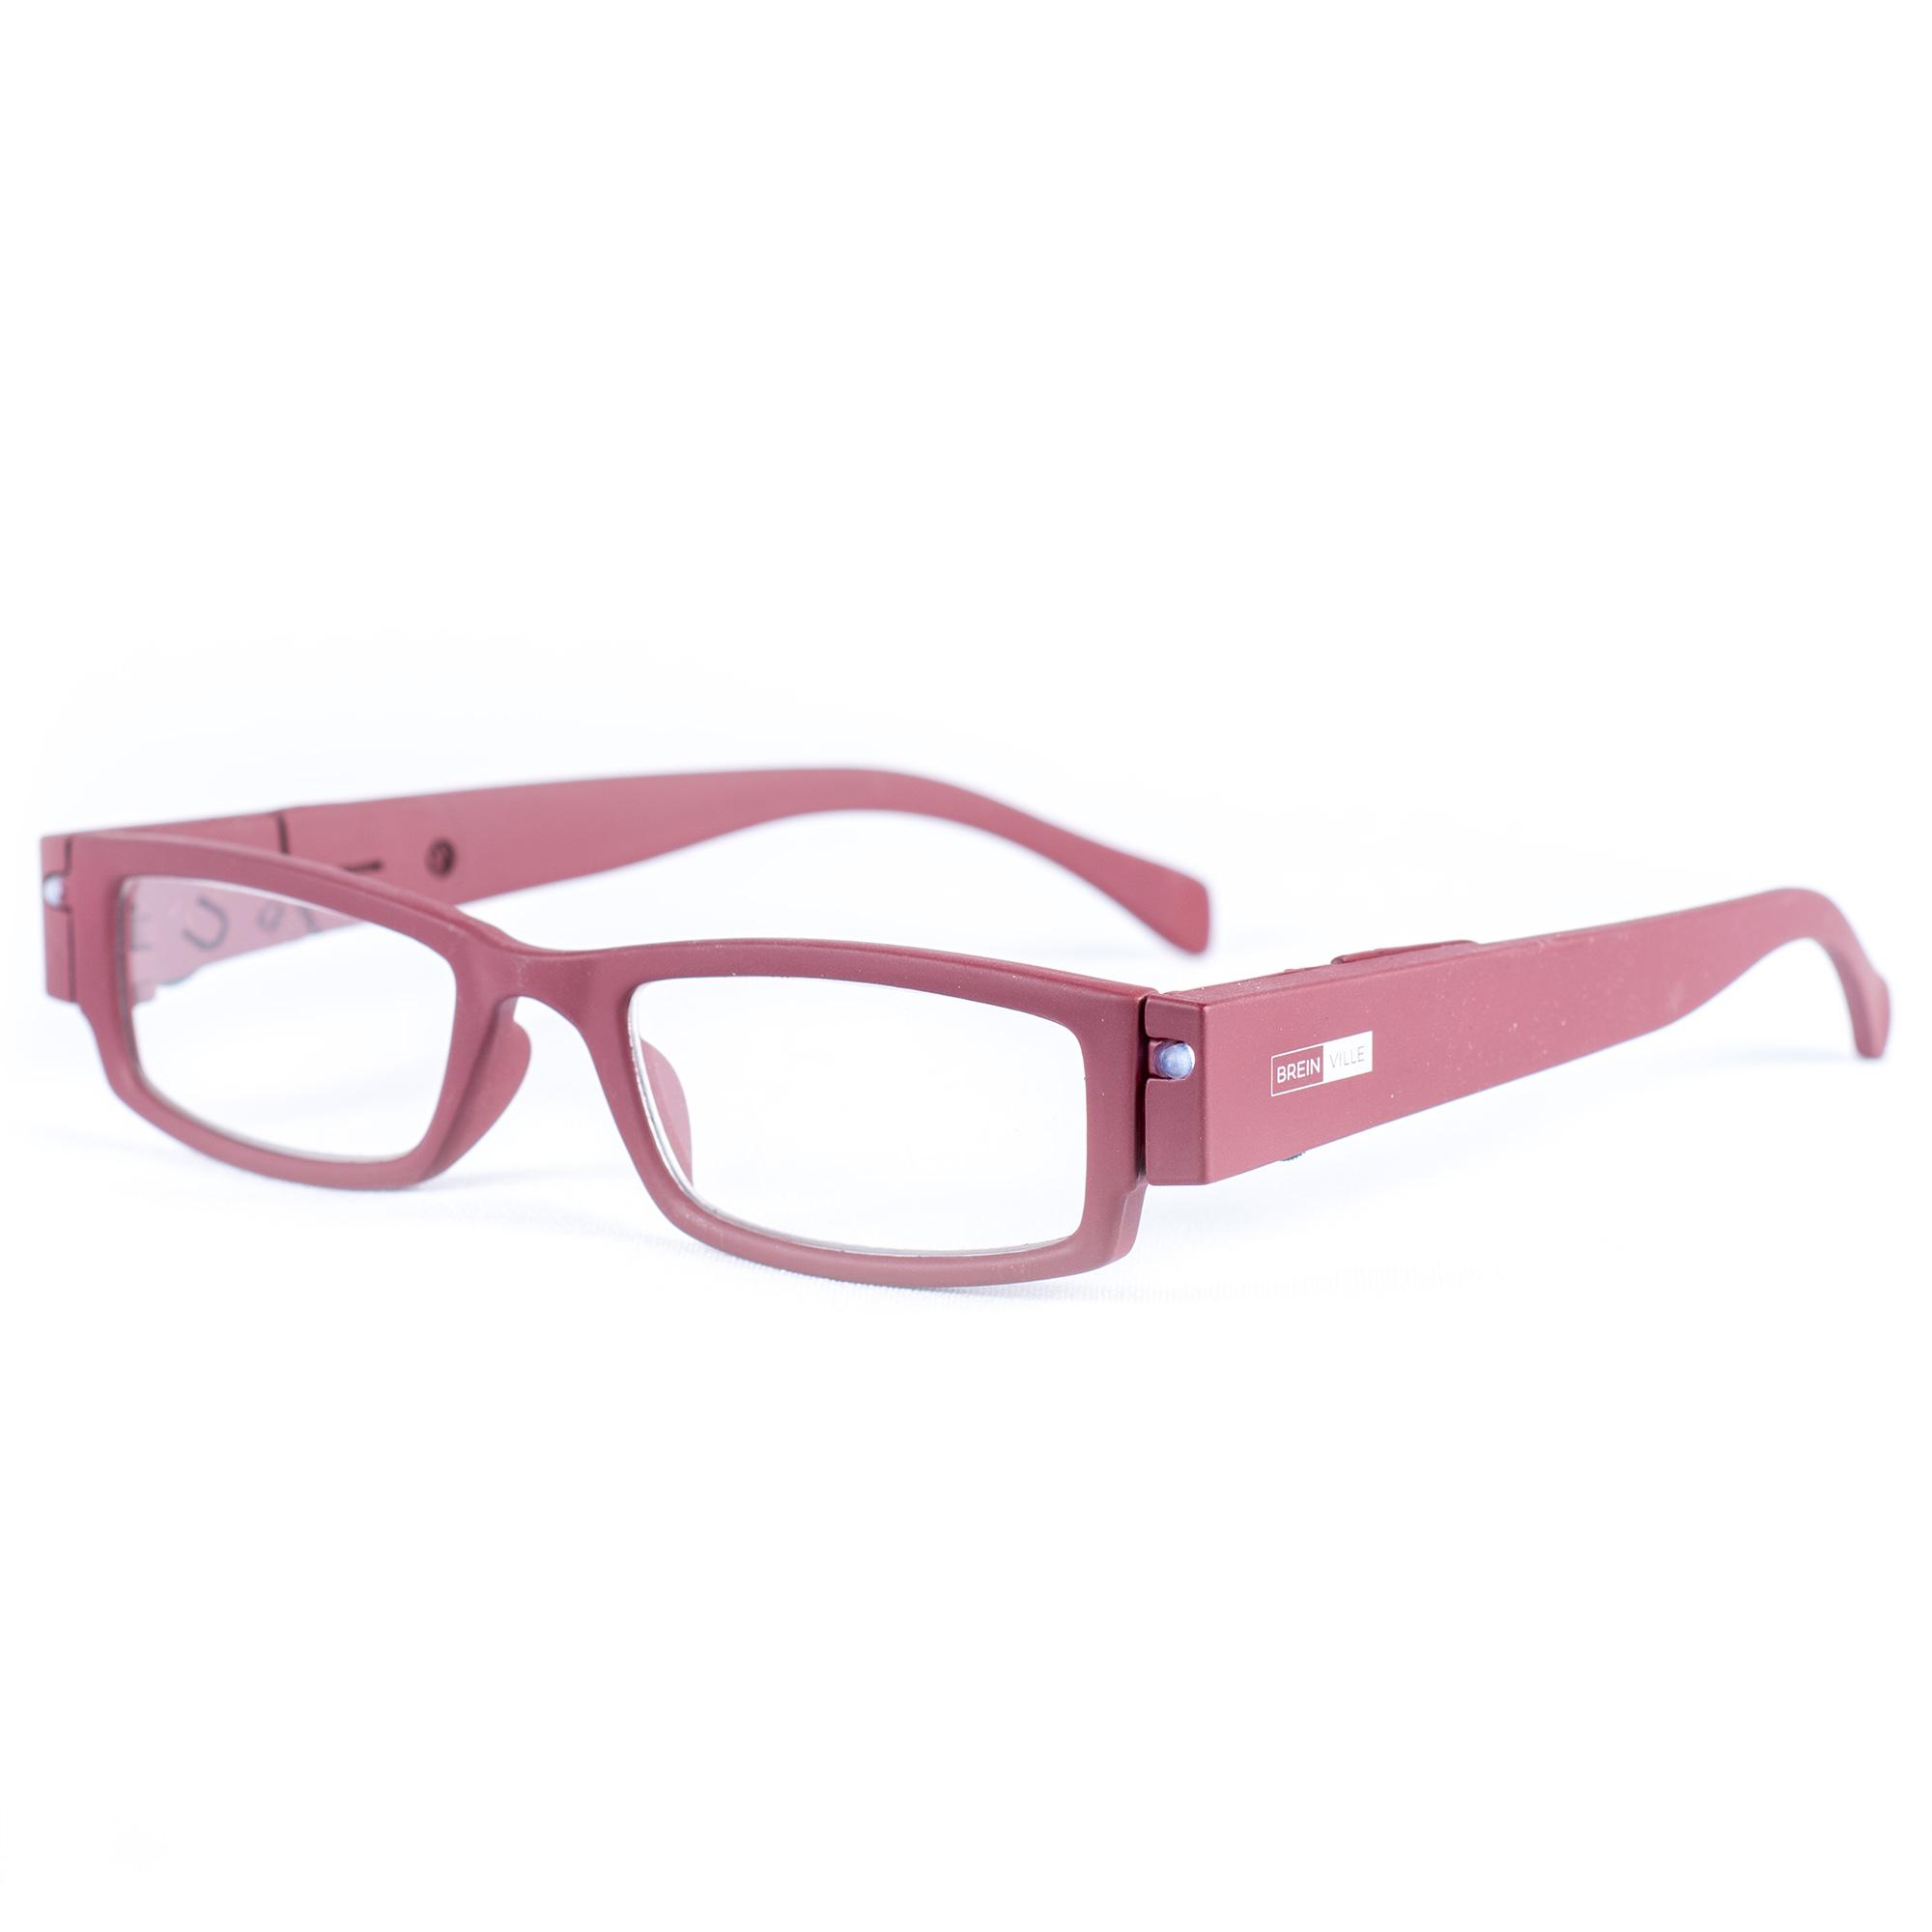 LED leesbril rood. Leesbril met LED-verlichting in mat rood.